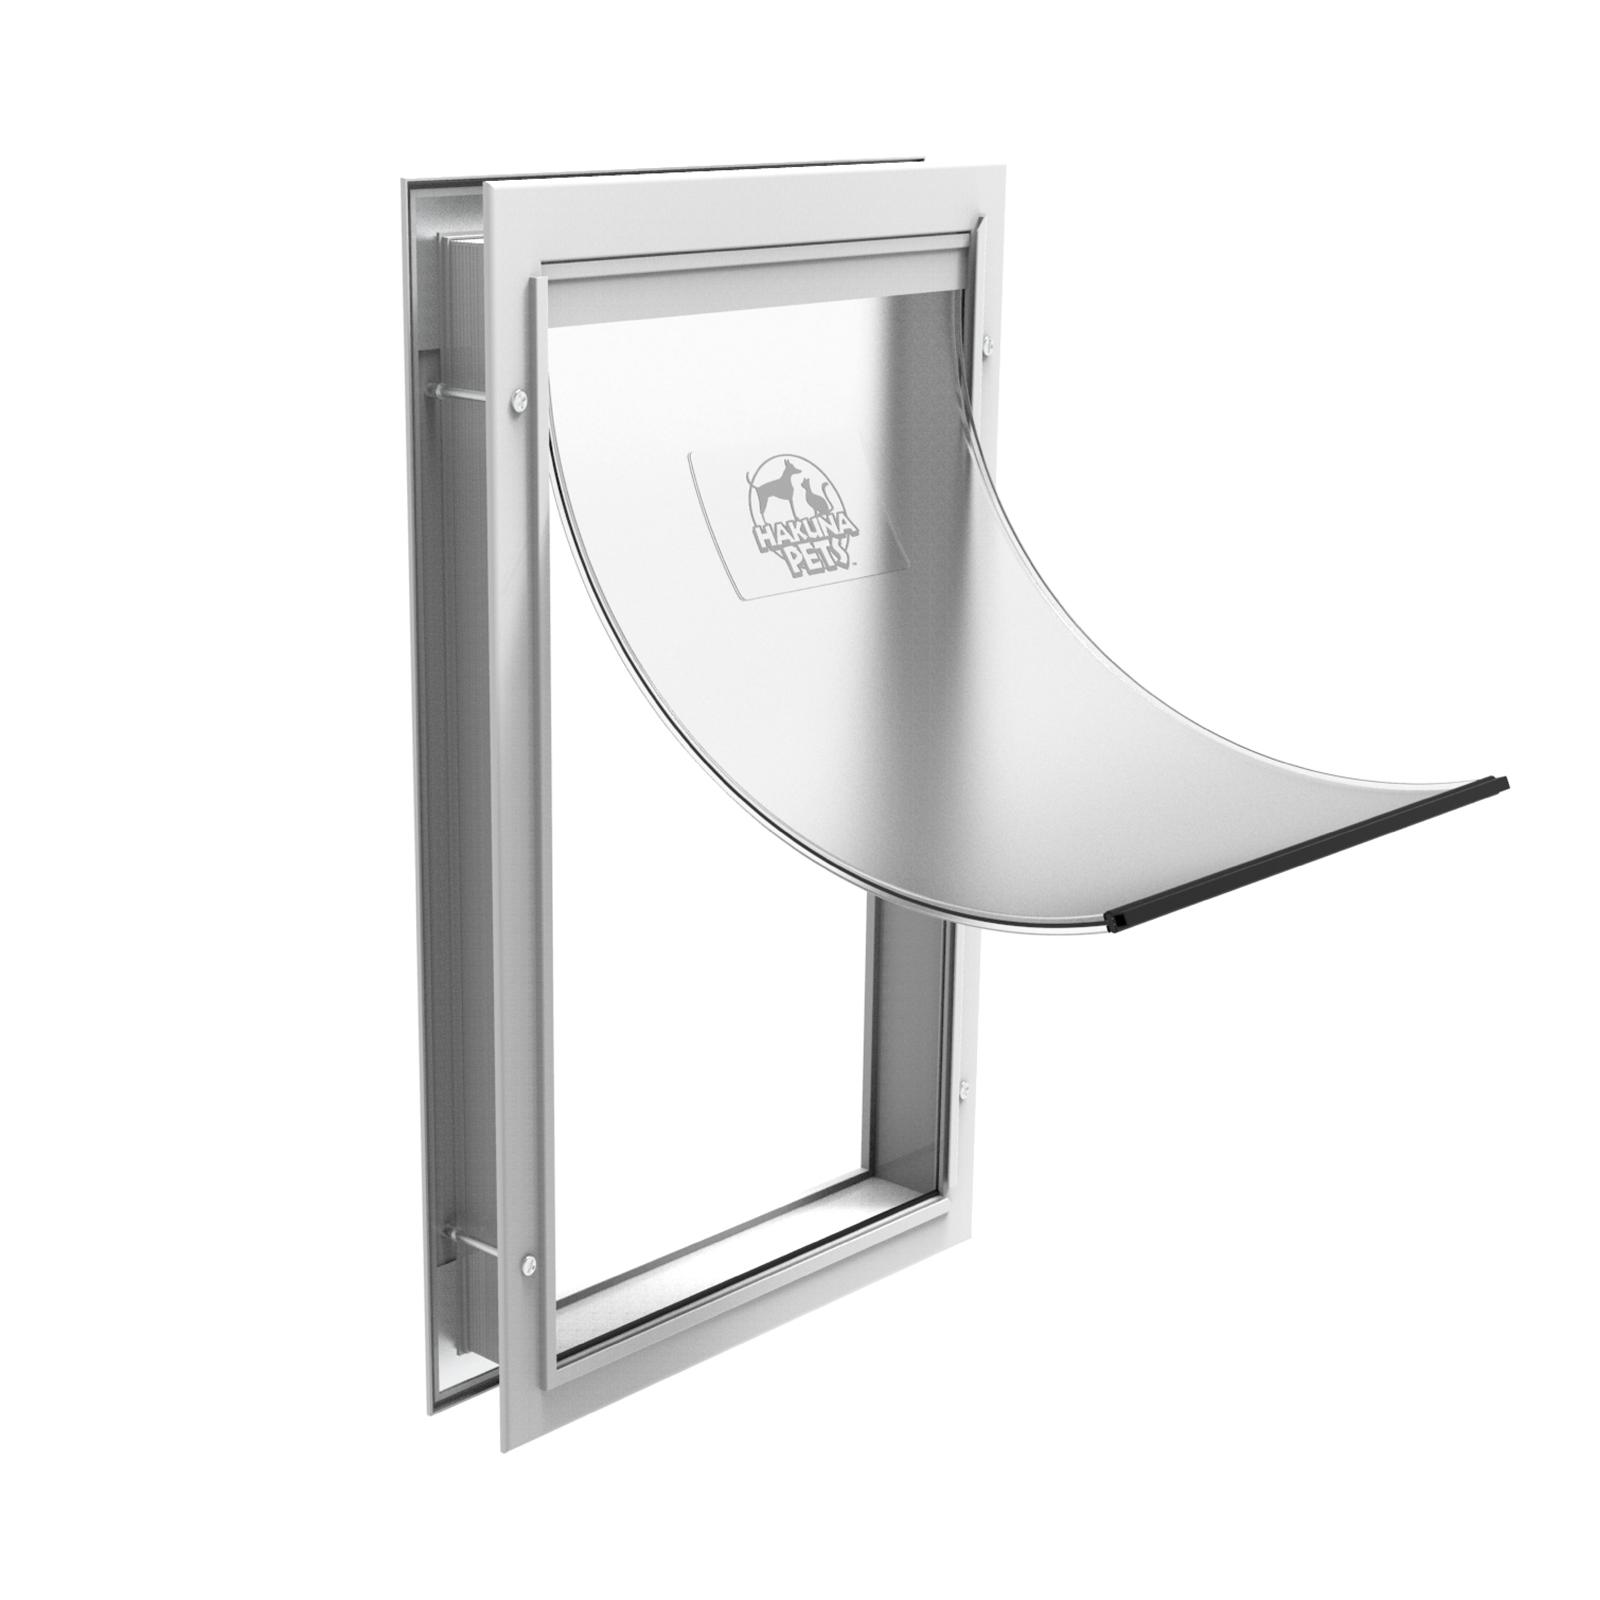 Hakuna Pets Extra Large White Deluxe Aluminium Pet Door